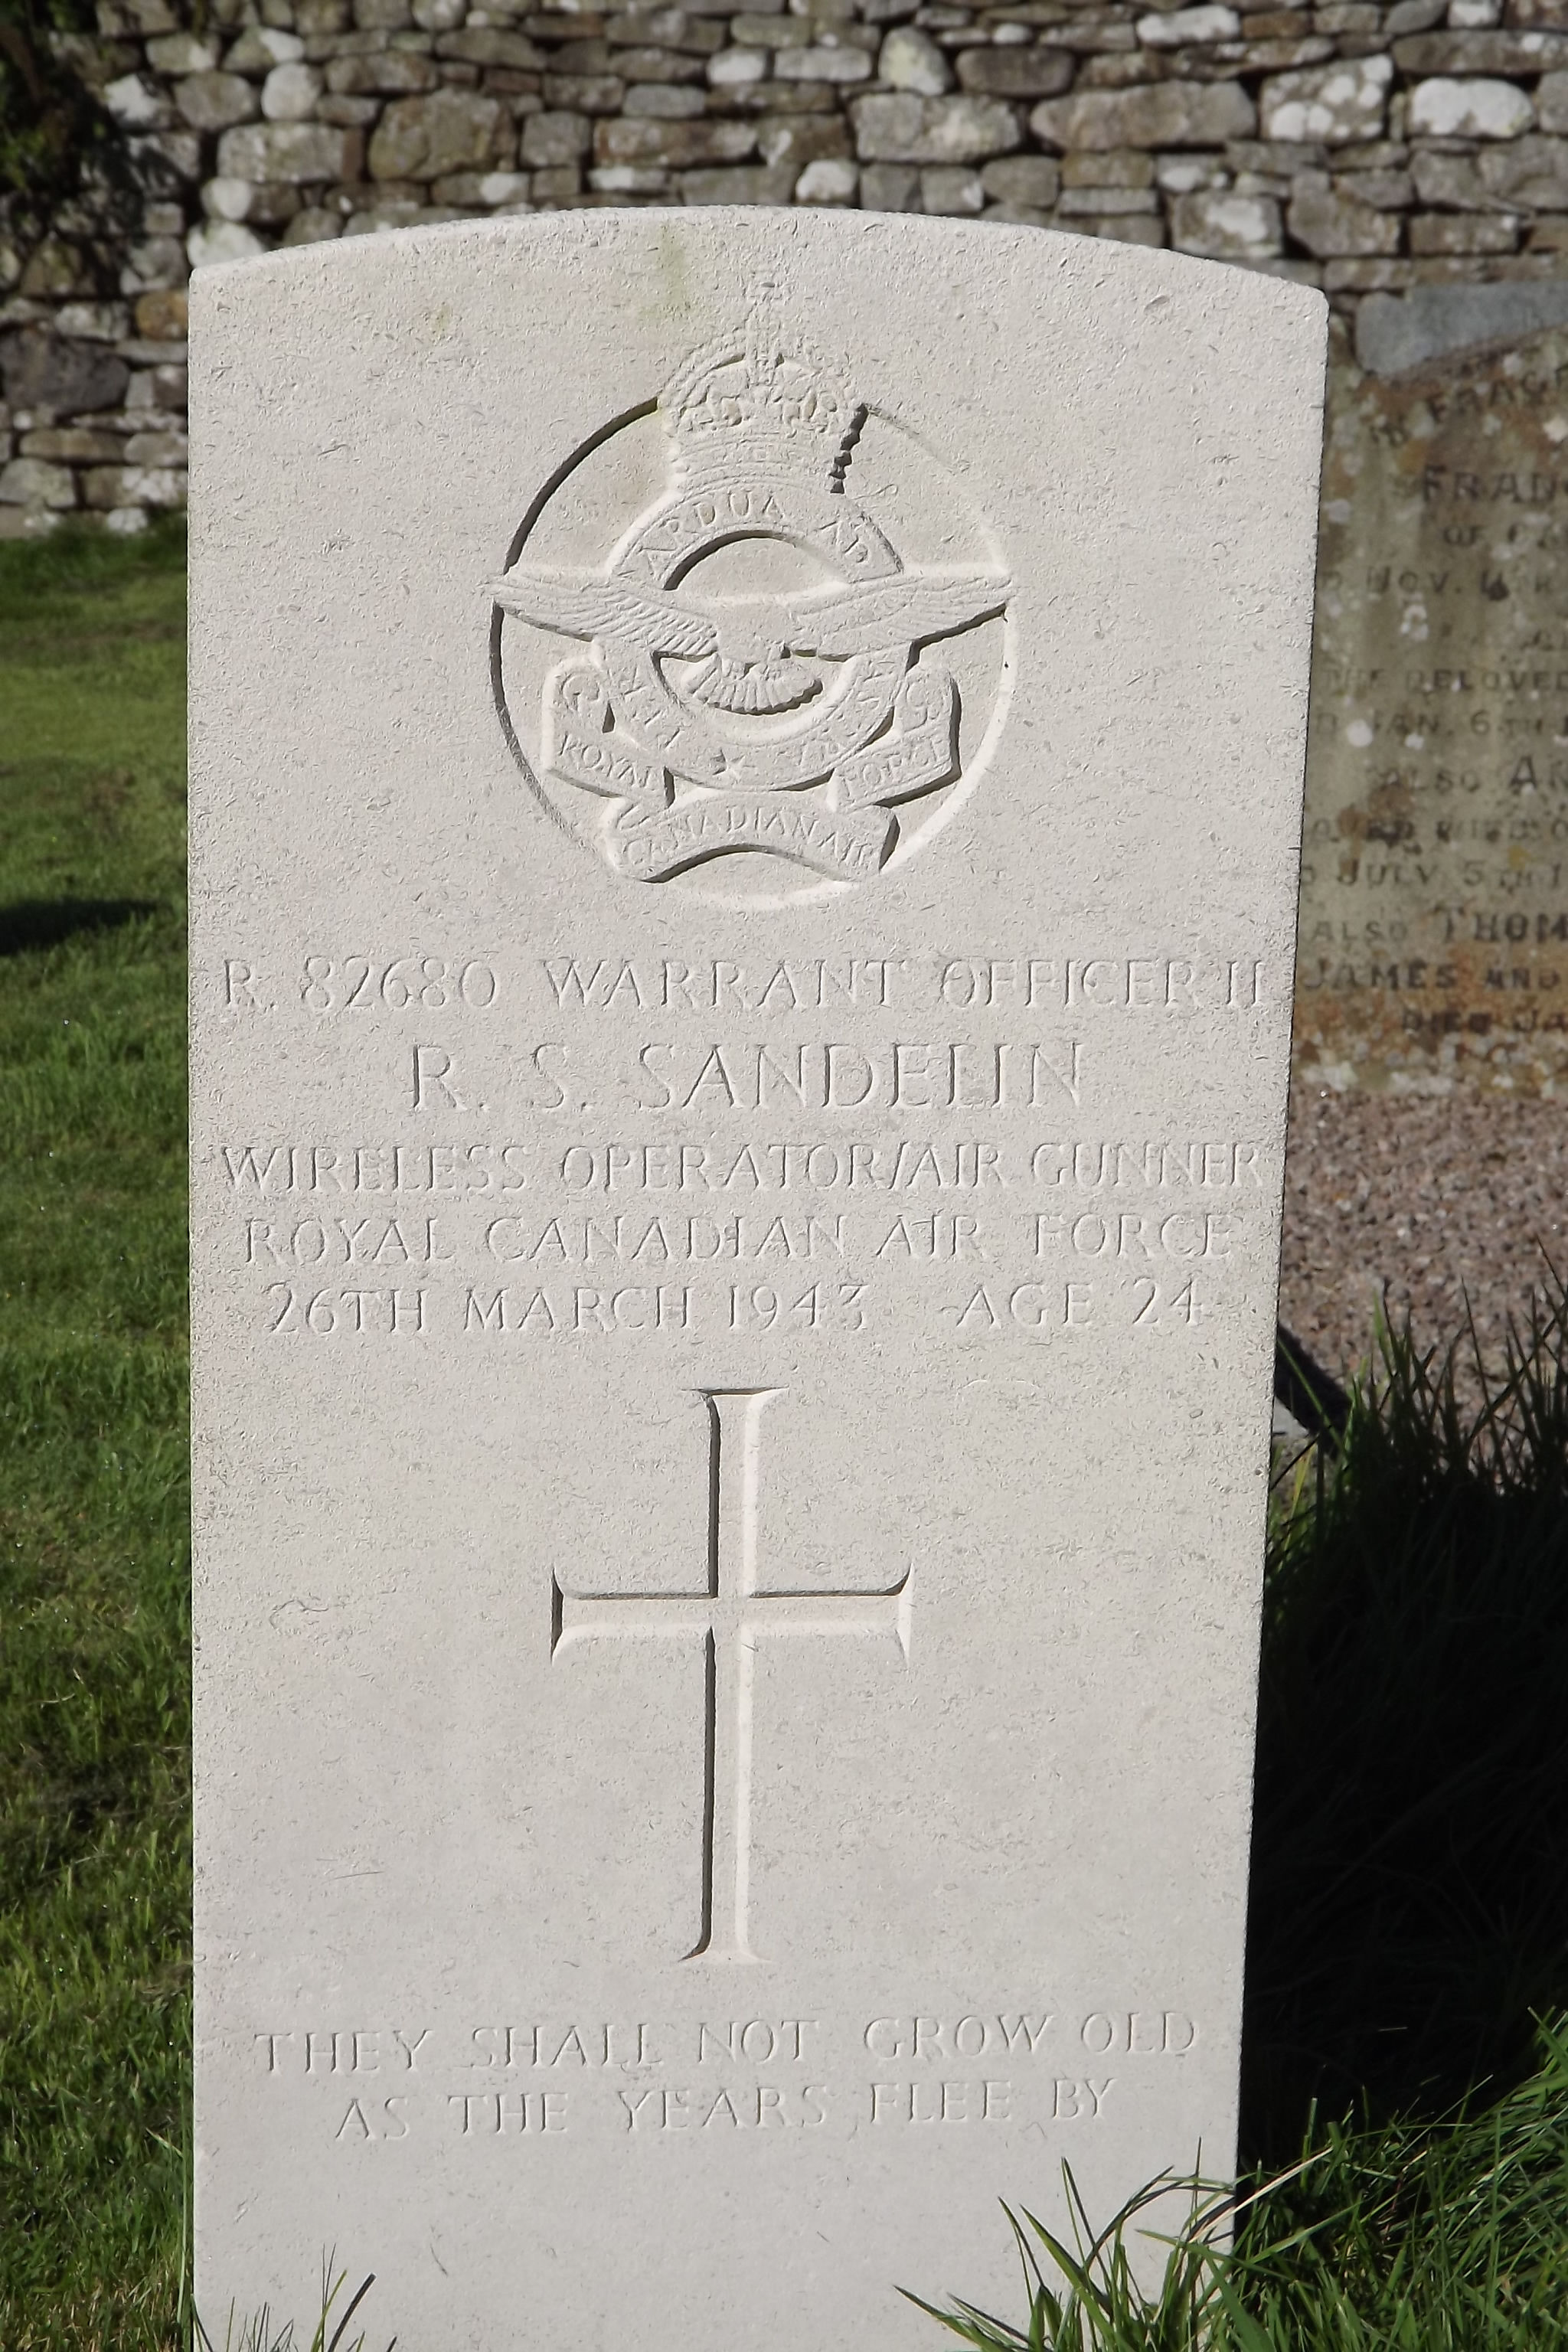 Grave Marker– Grave of Robert Simeon SANDELIN, Royal Canadian Air Force Died 26/3/1943